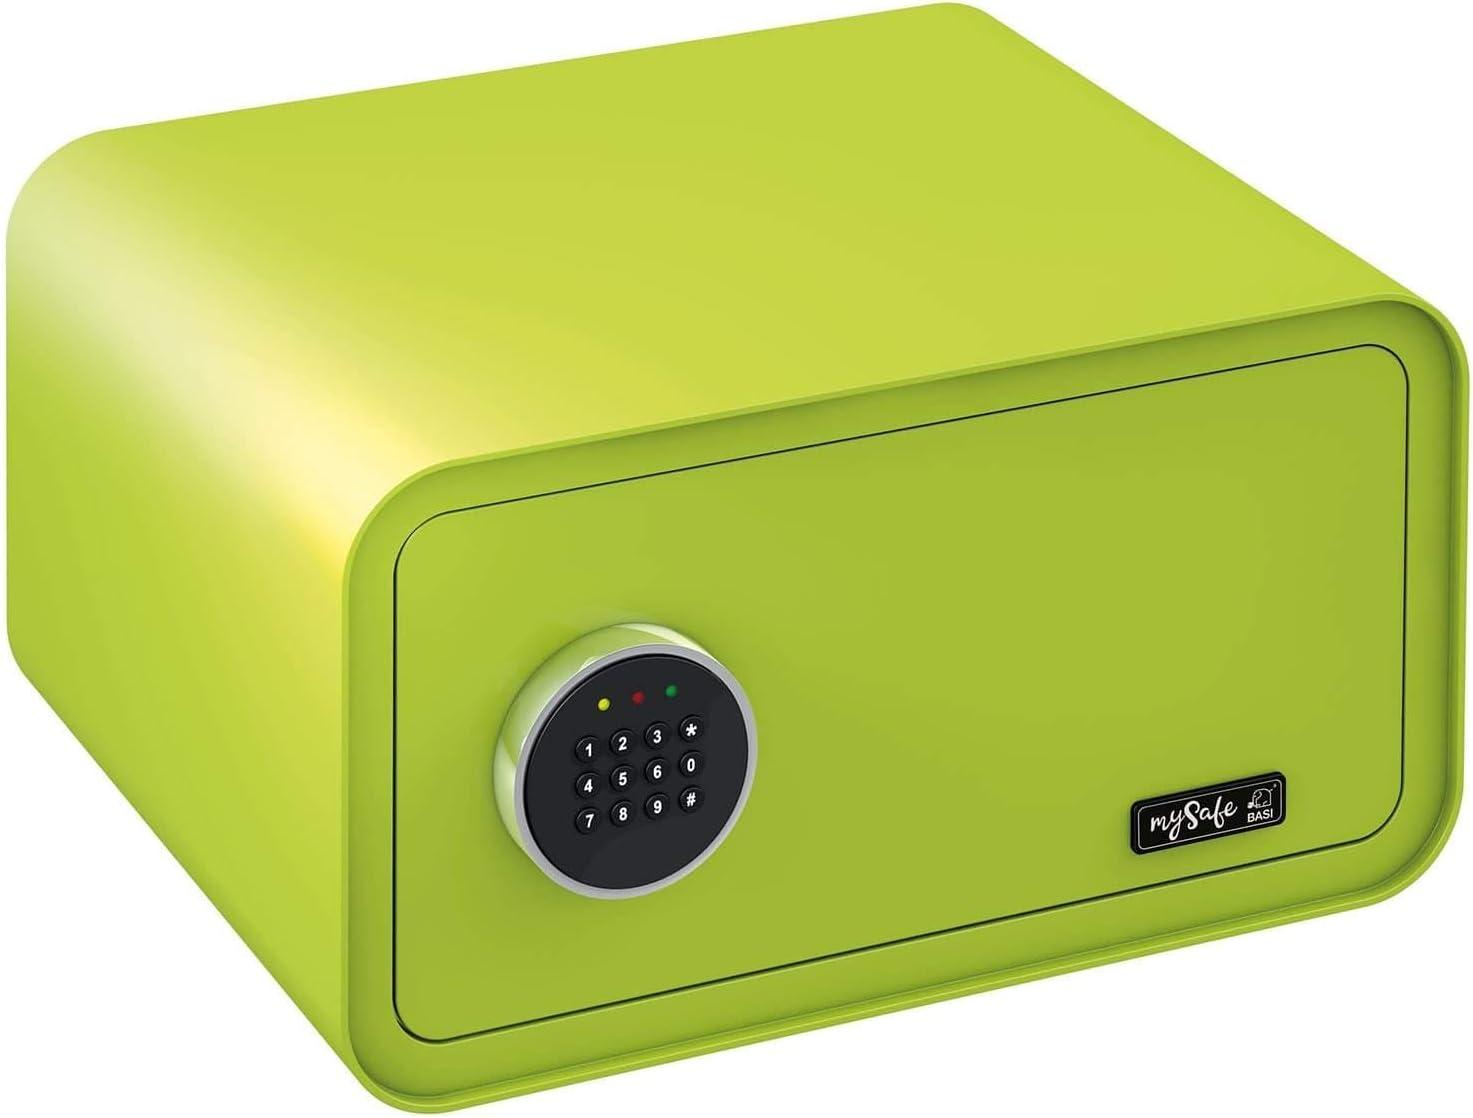 MySafe A x L x P viola codice numerico Verde rosa 230 x 430 x 350 mm blu//bianco disponibile in diversi colori verde Cassaforte di design